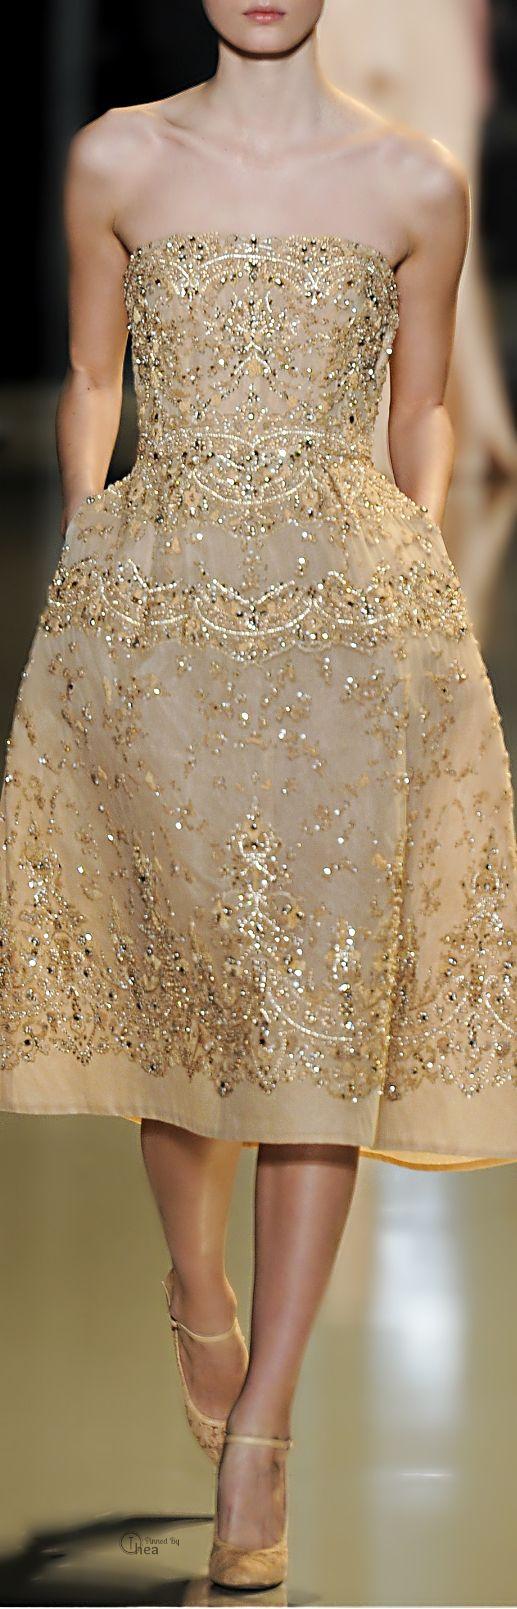 Highlights : Chanel, Dior, Elie Saab & Co. | Elie saab couture ...